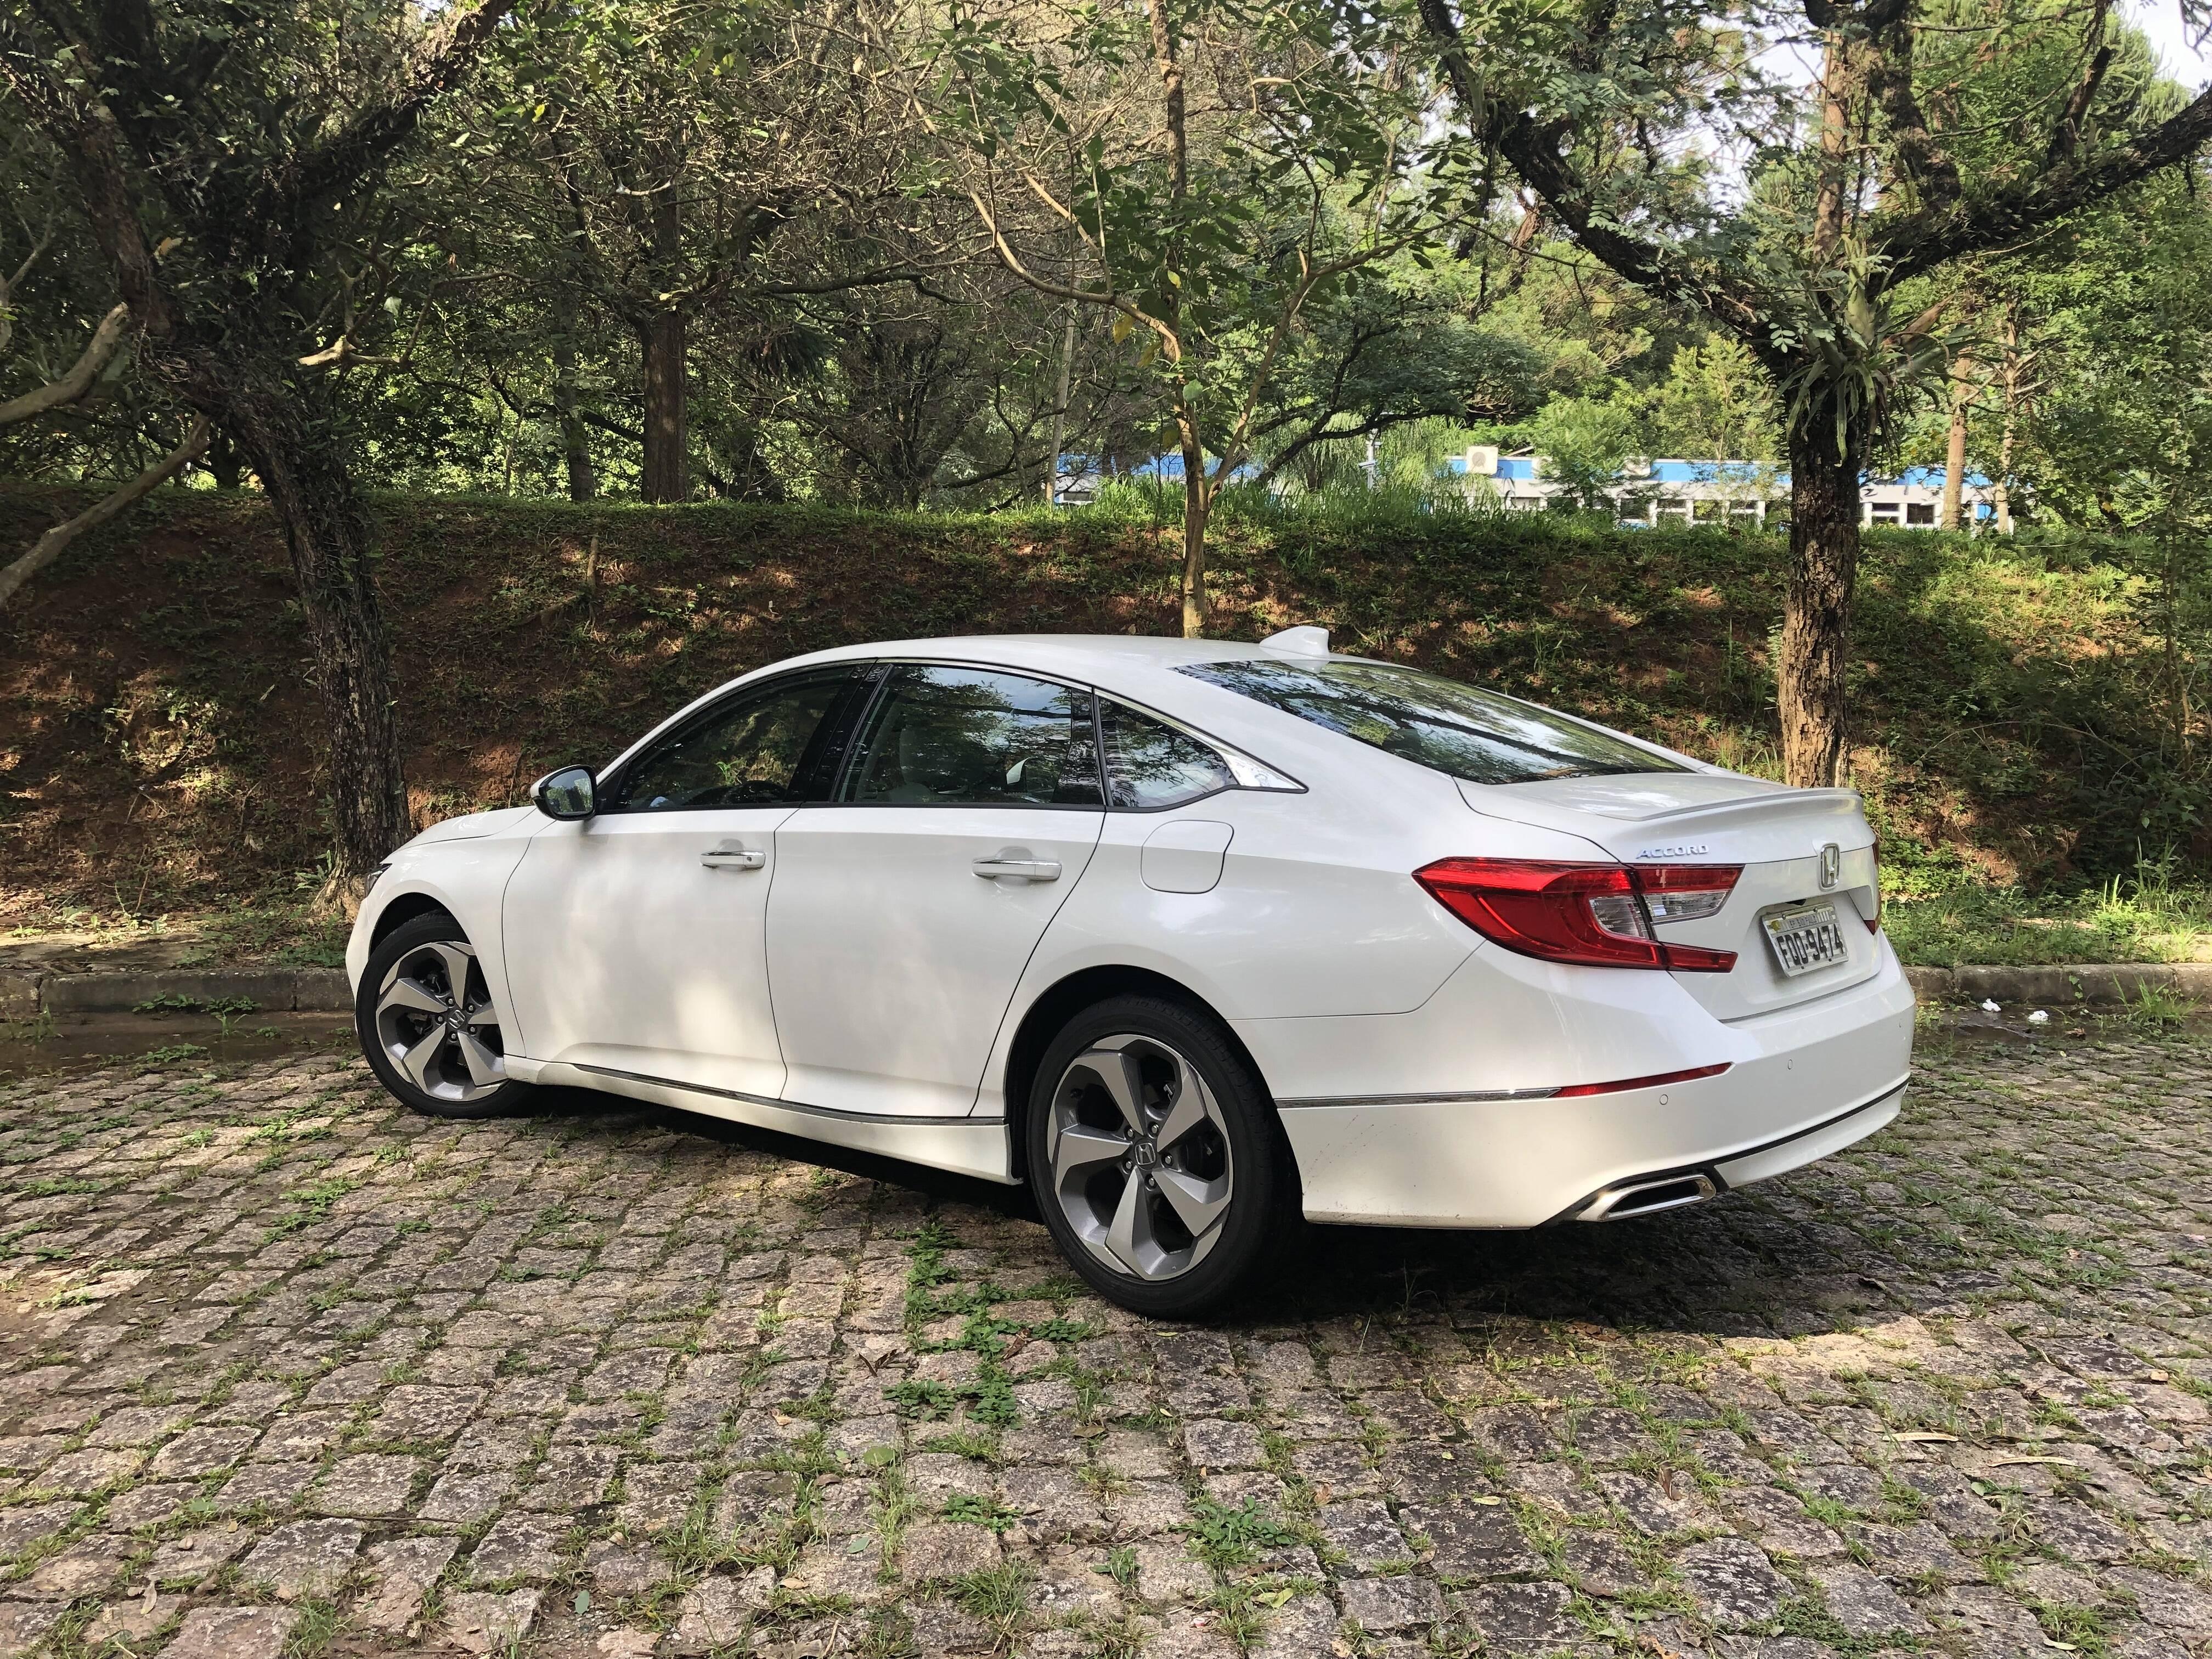 Honda Accord 2019. Foto: Cauê Lira/iG Carros